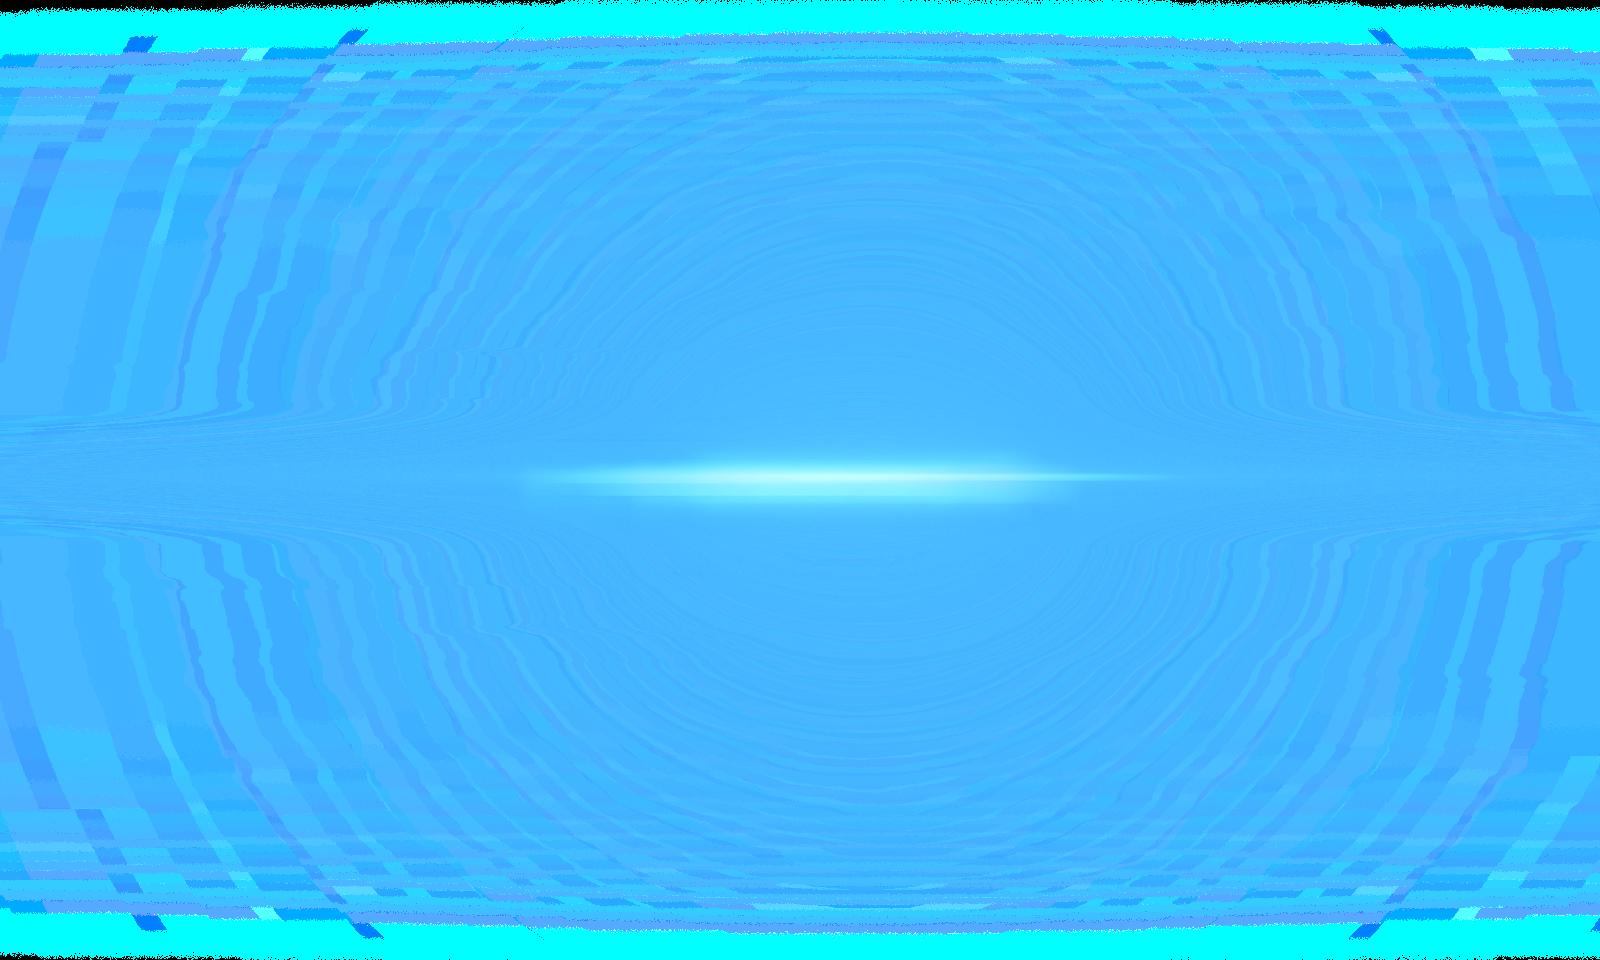 Hd Lens Flare Png Transparent Background 46205 Free